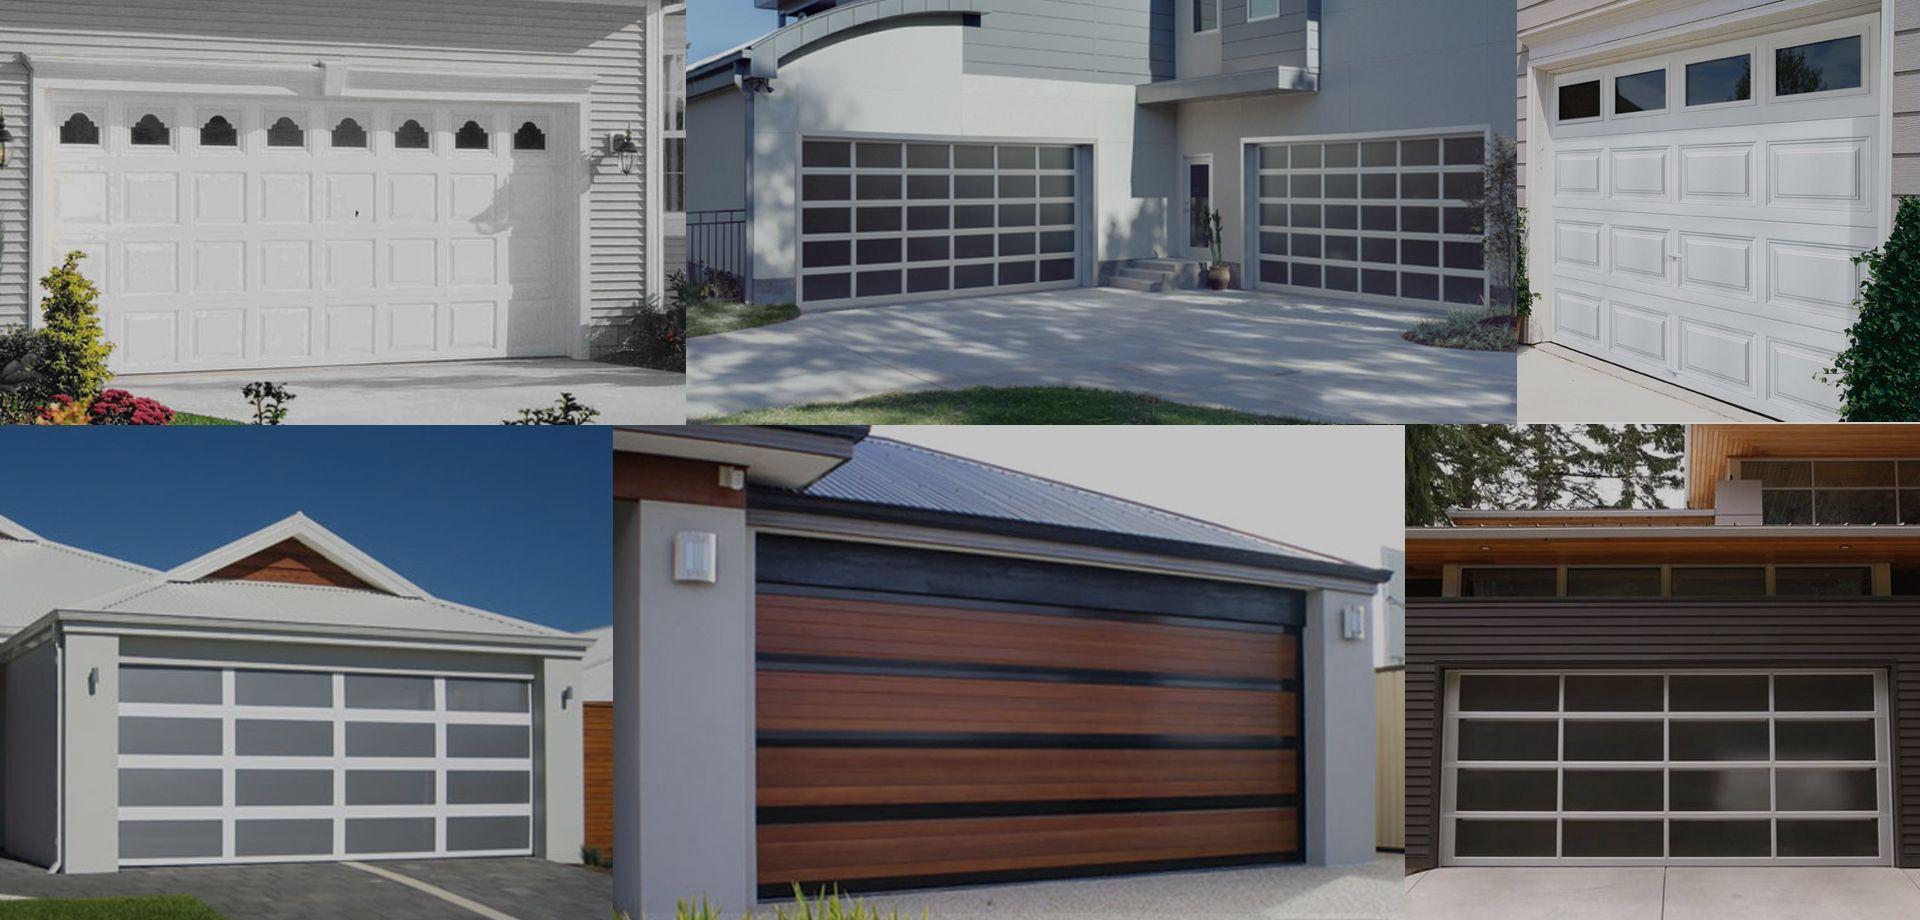 Garage Door Distributors Cicero Il Httpvoteno123